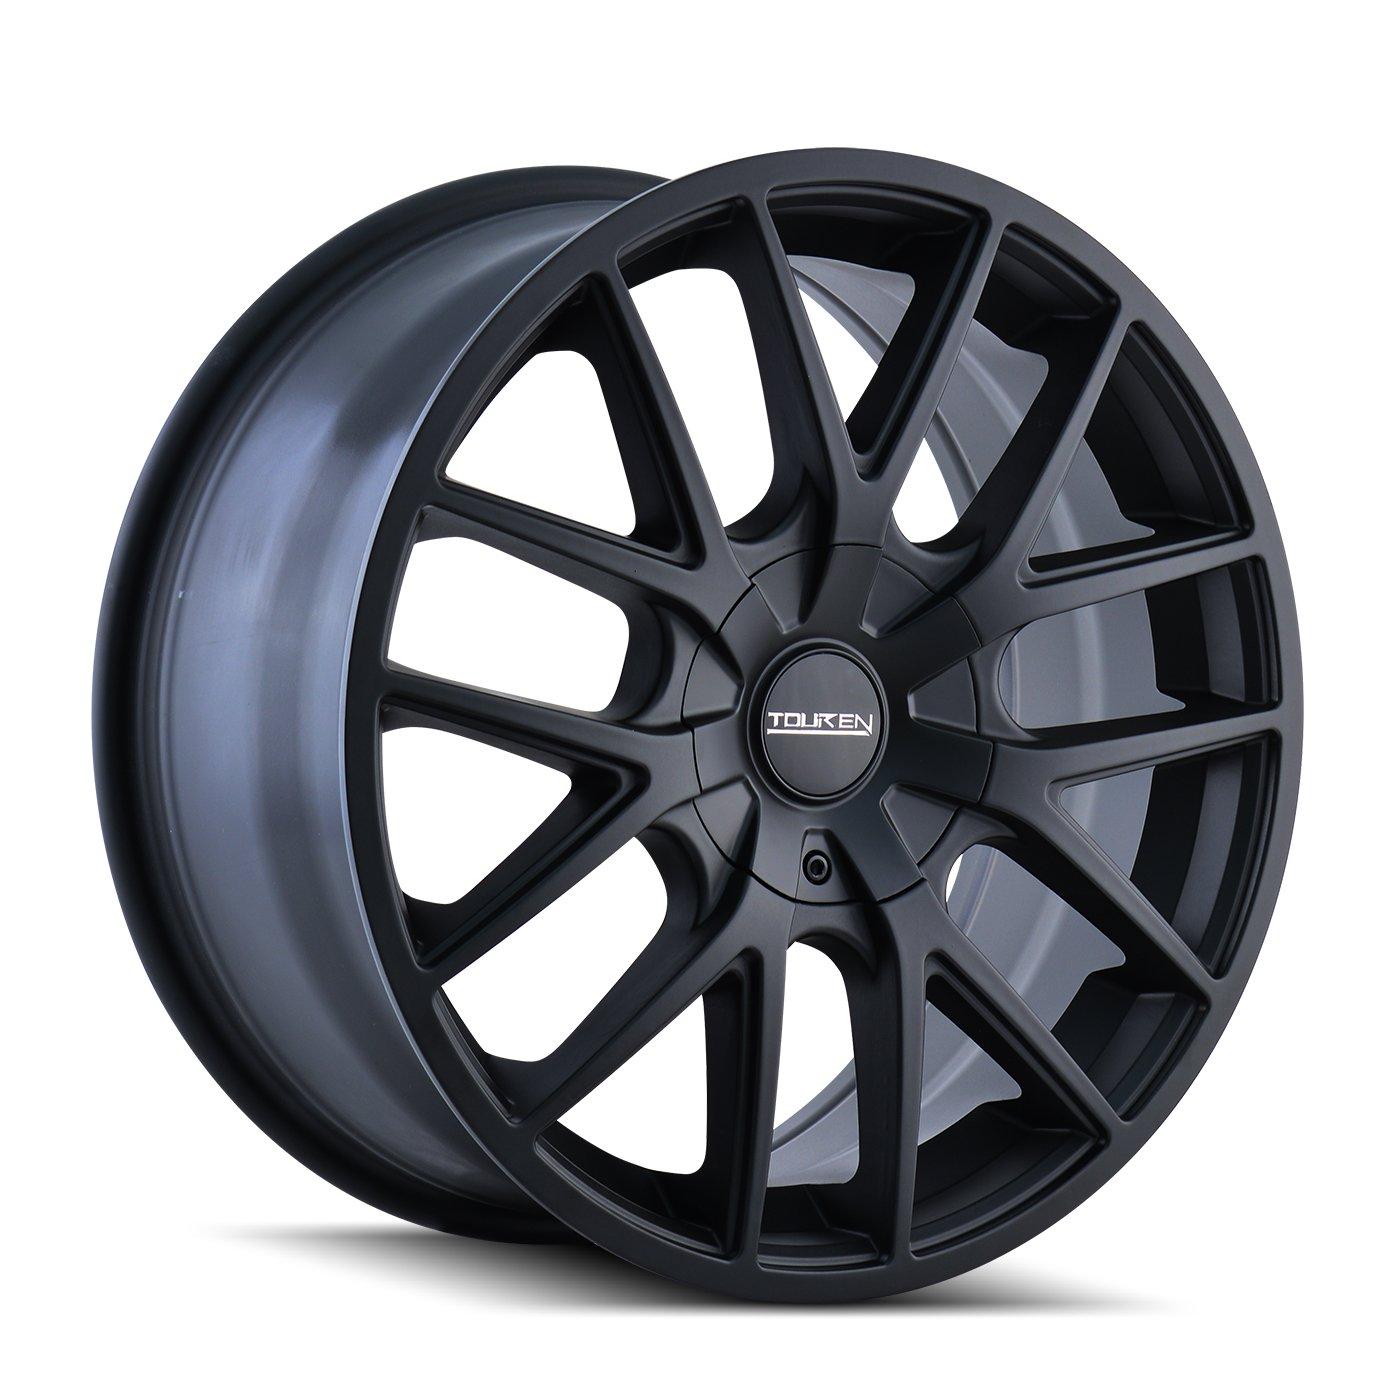 22x14//6x139.7mm LRG Rims LRG103 Sandman Wheel with Chrome Finish